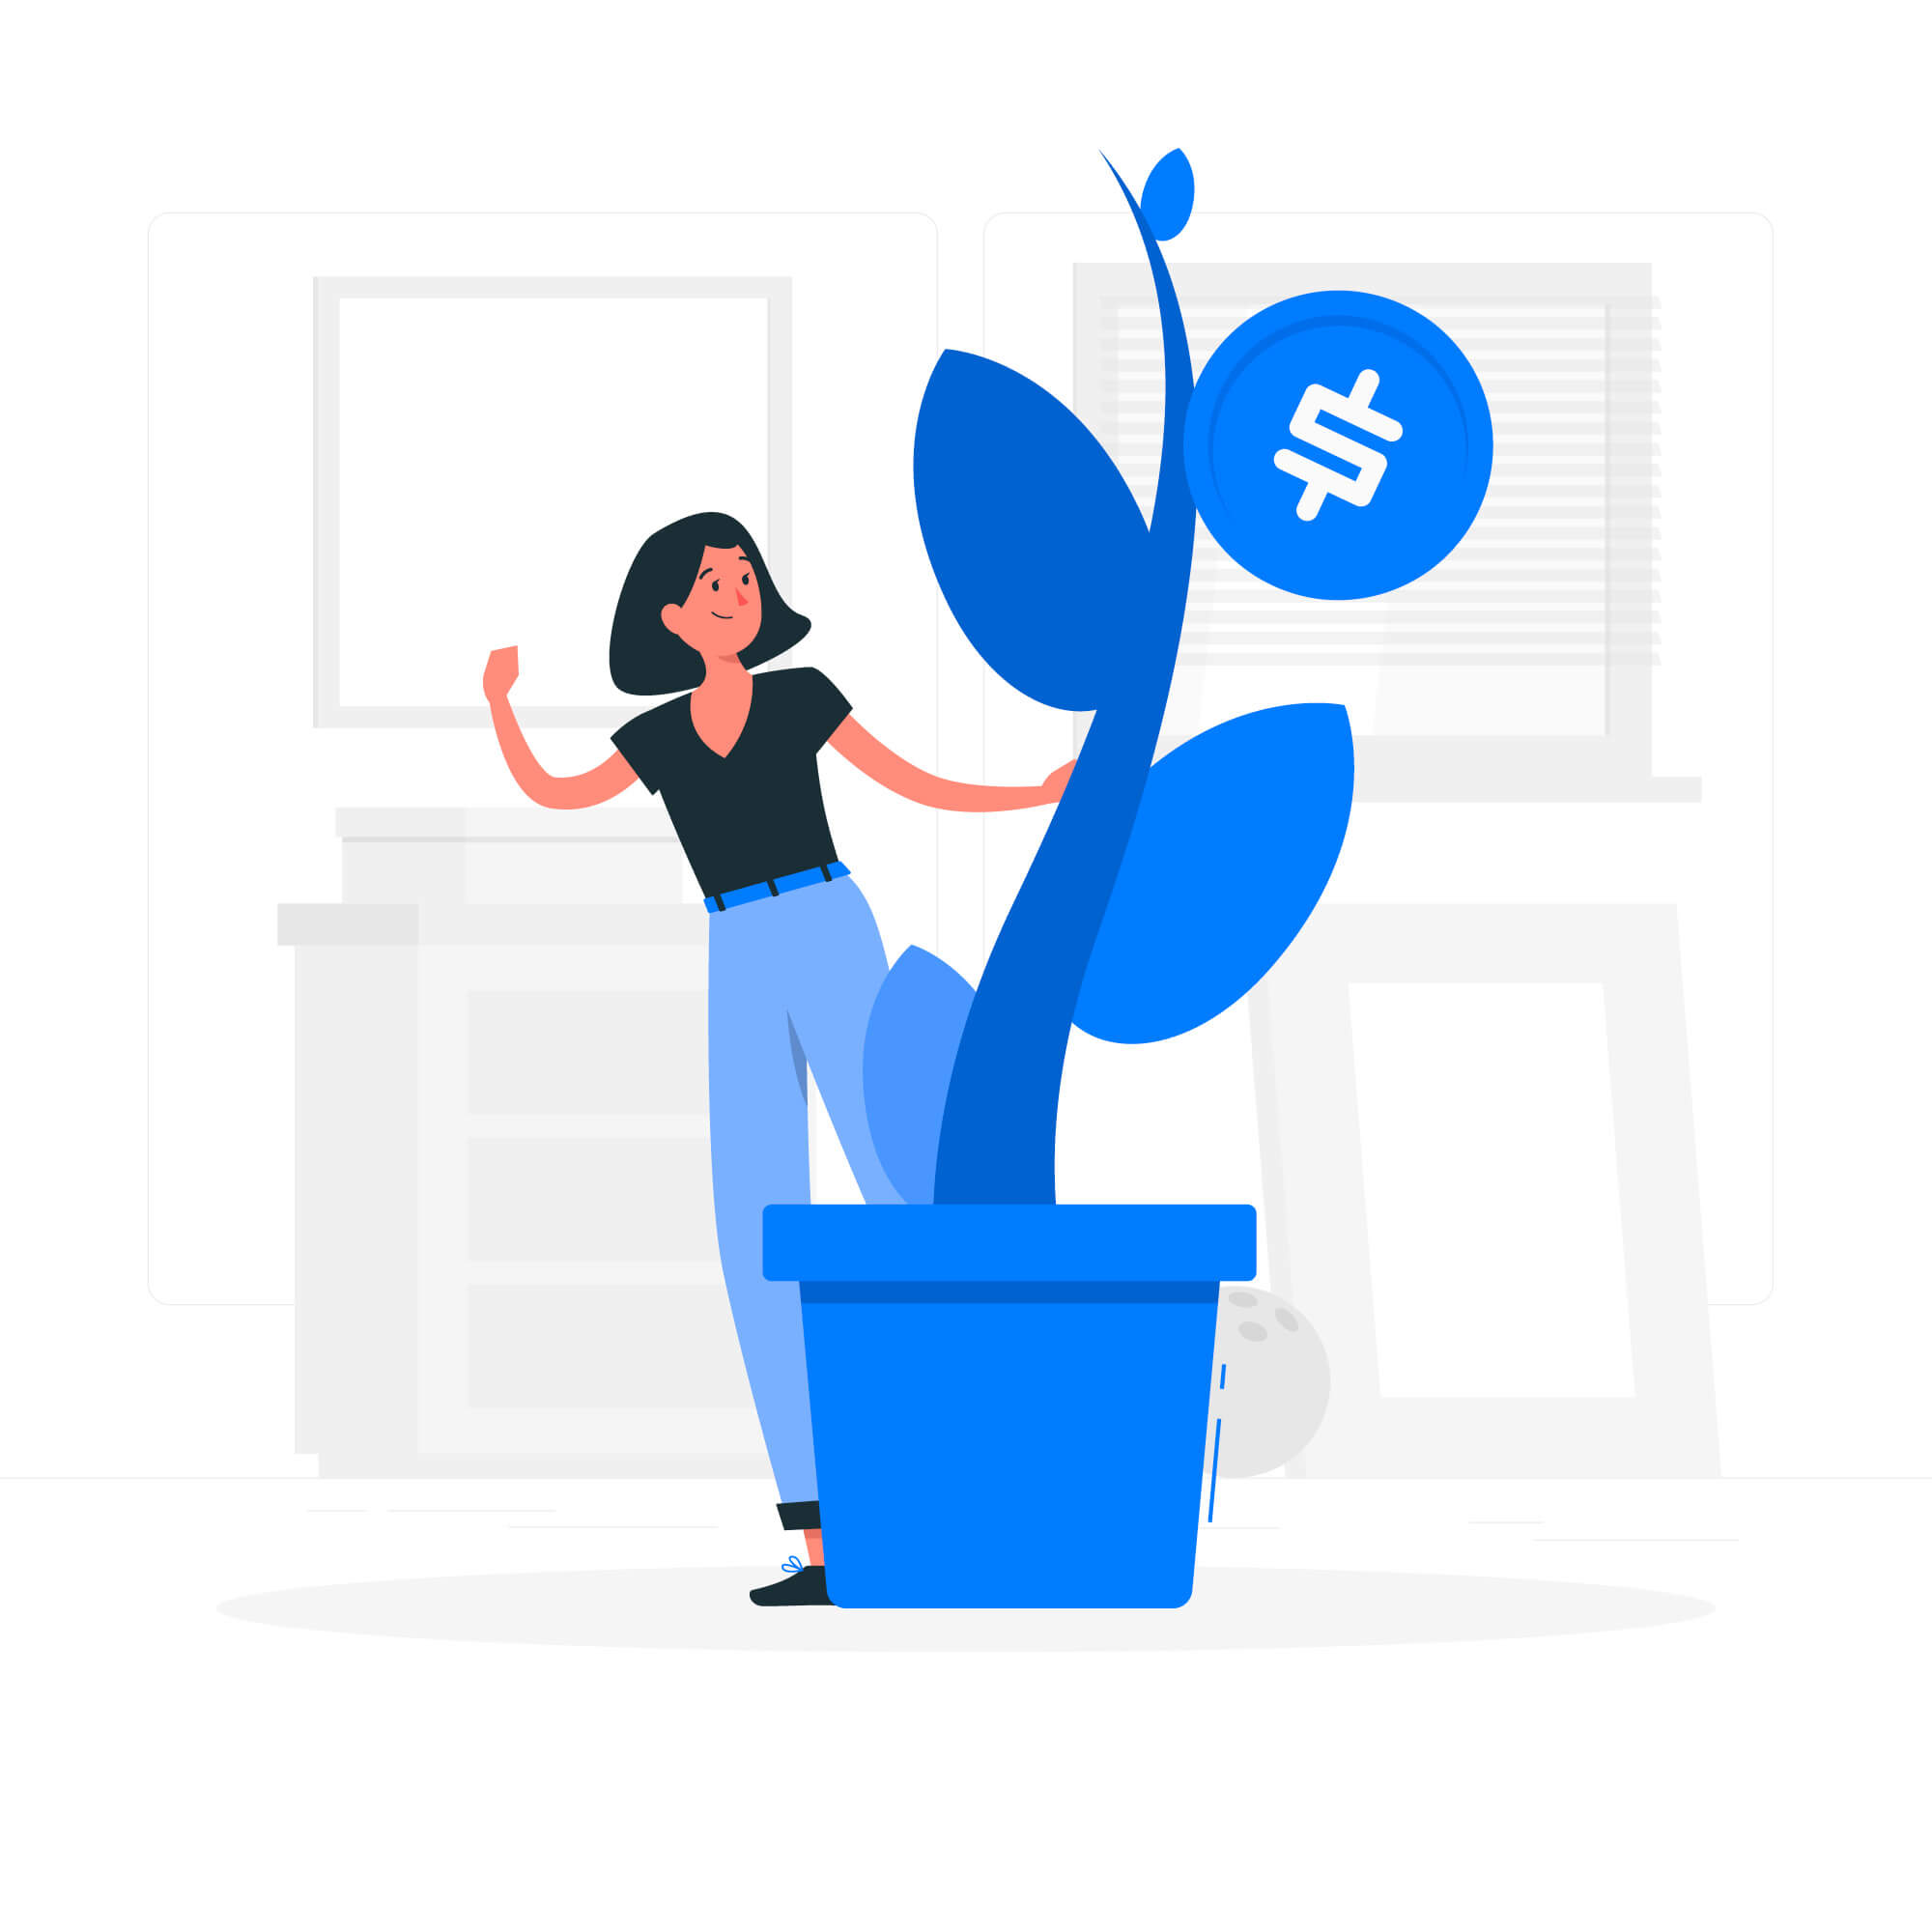 digital growth business